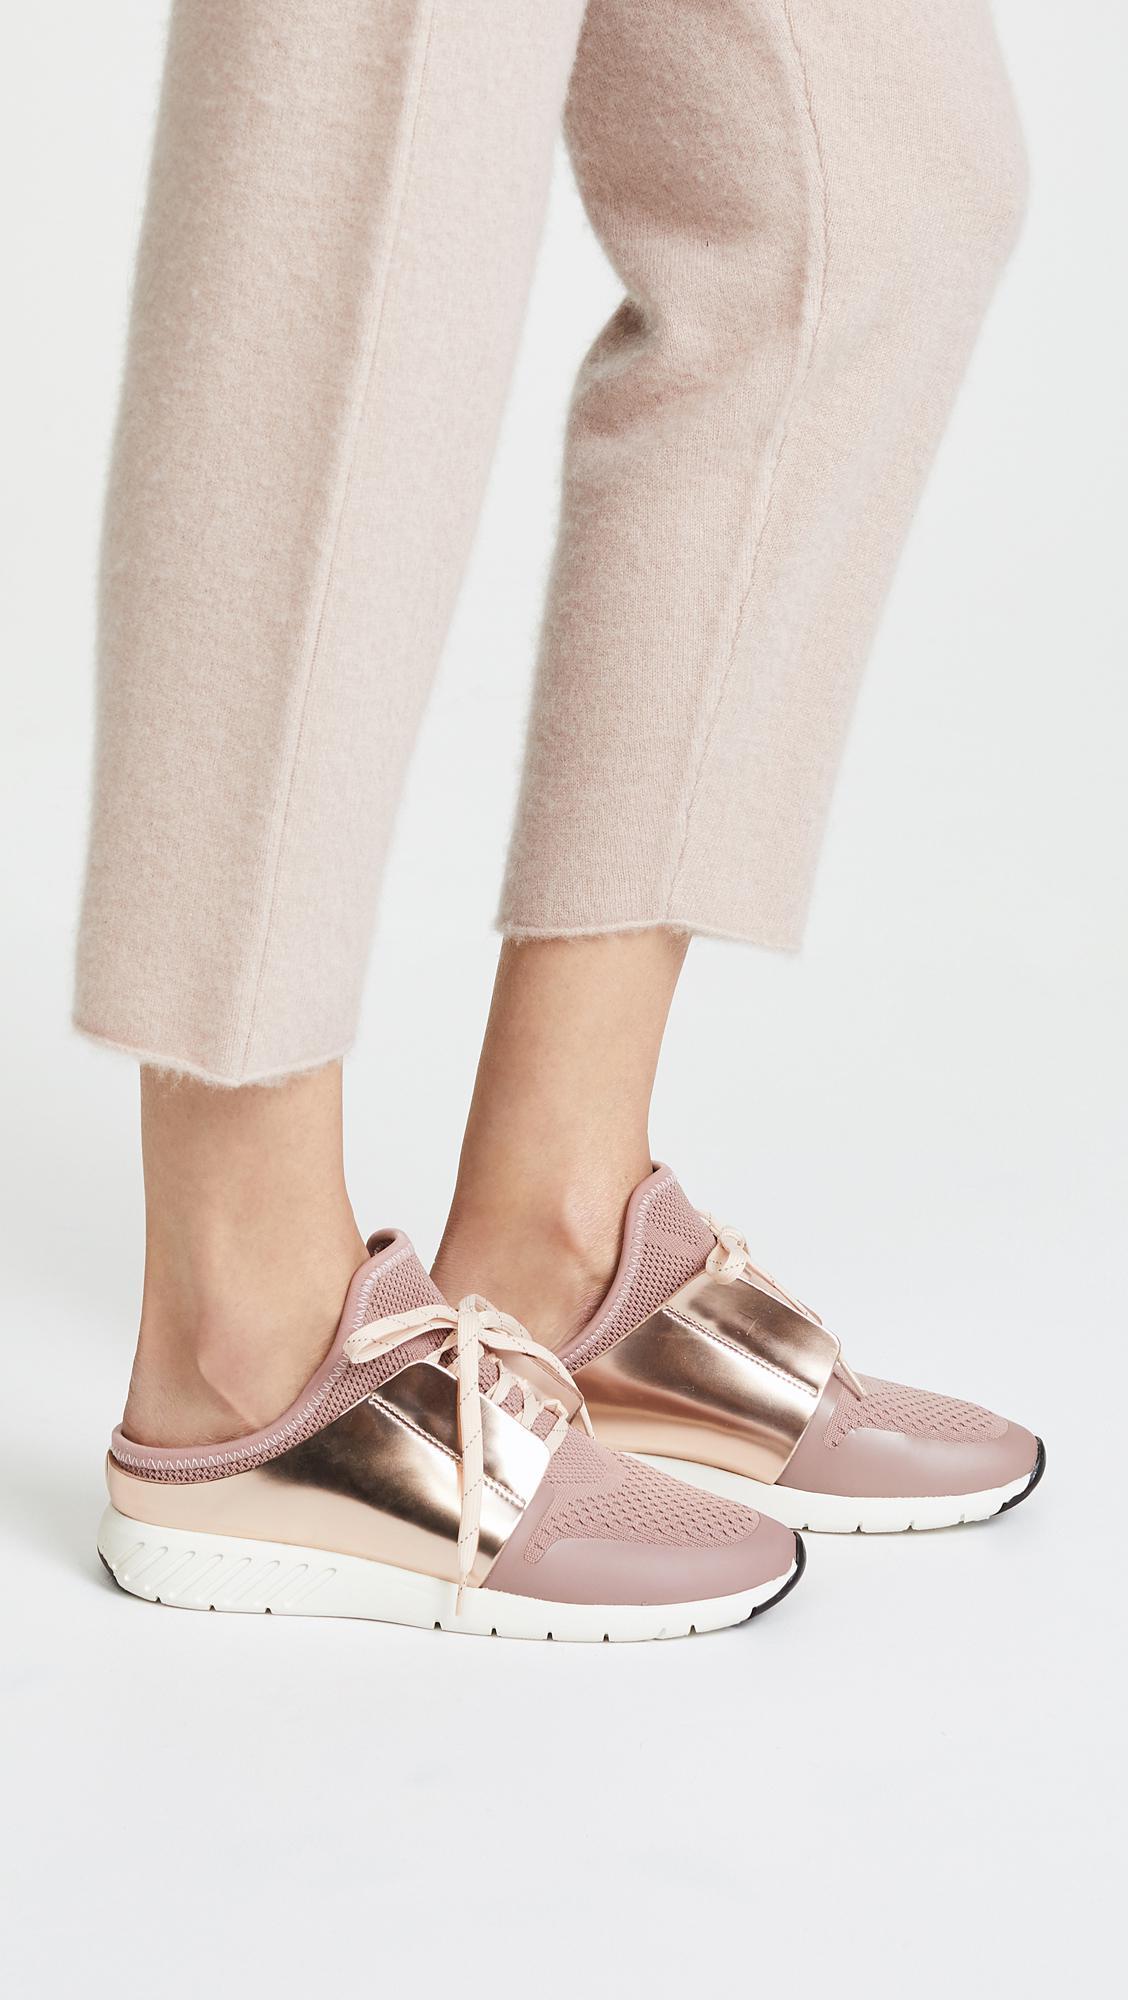 8afac4becb4 Lyst - Dolce Vita Braun Mule Sneakers in Pink